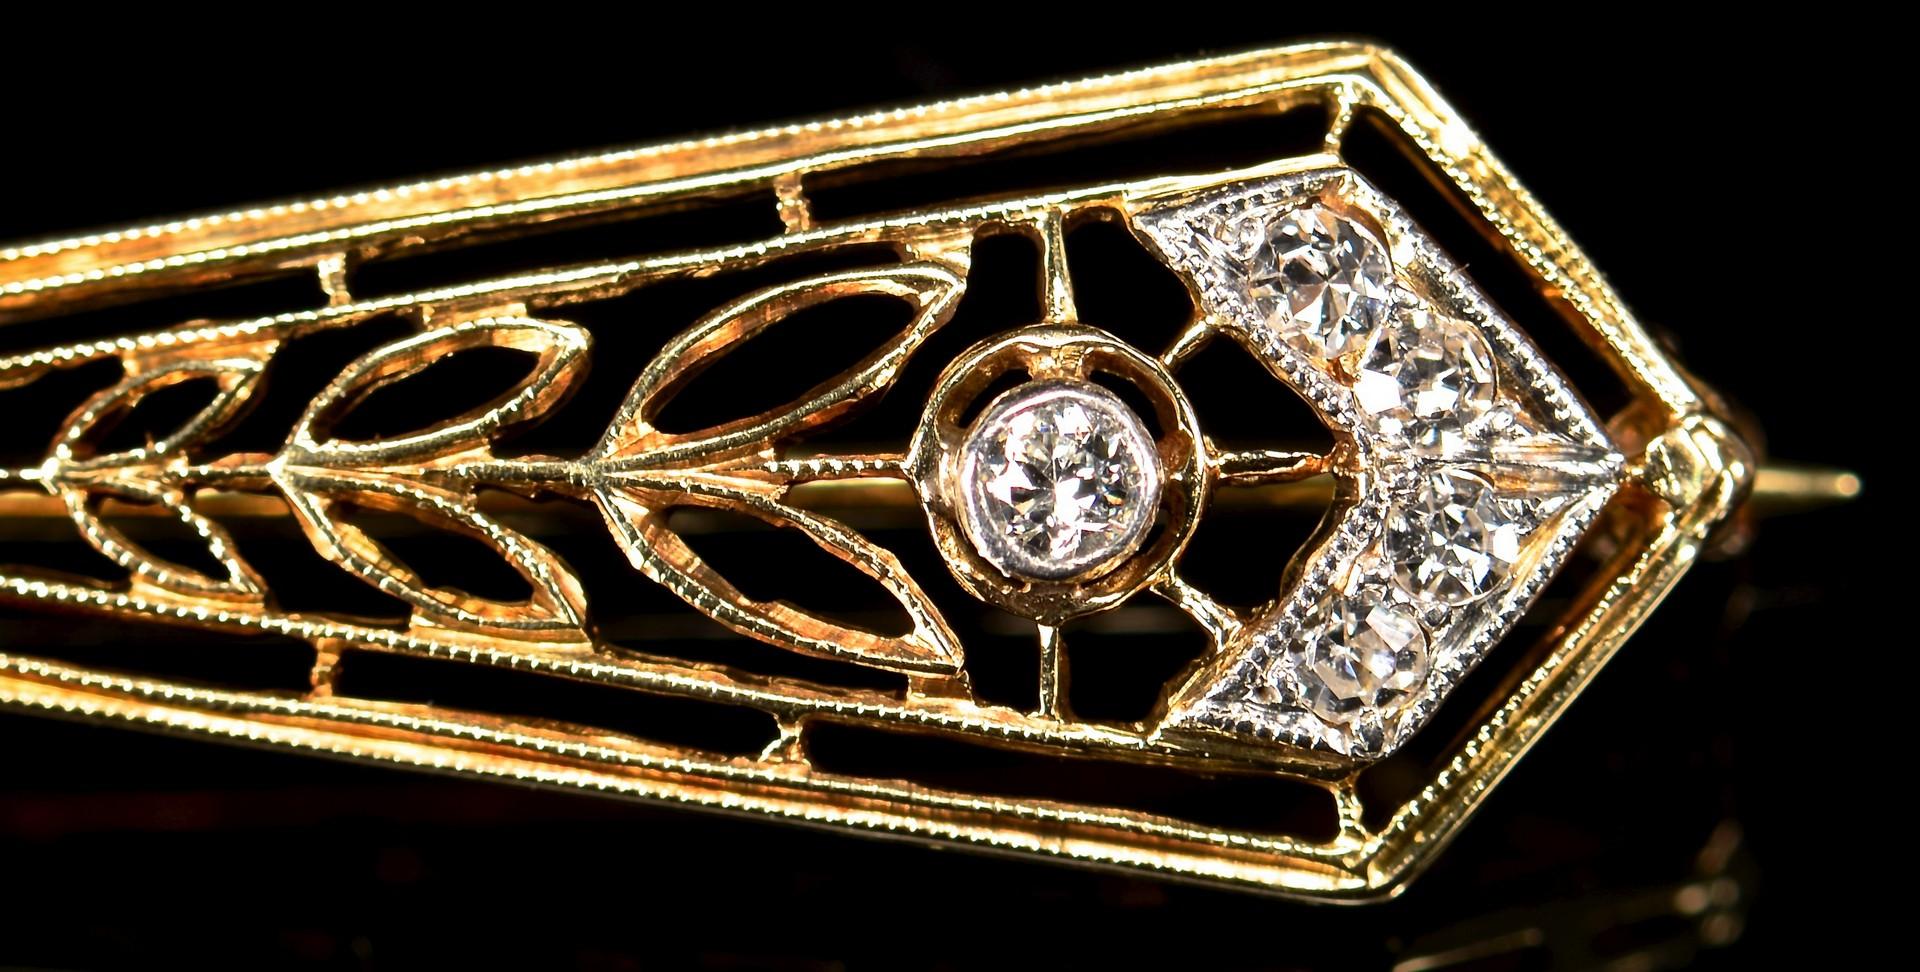 Lot 593: 2 Gold Diamond Jewelry Items